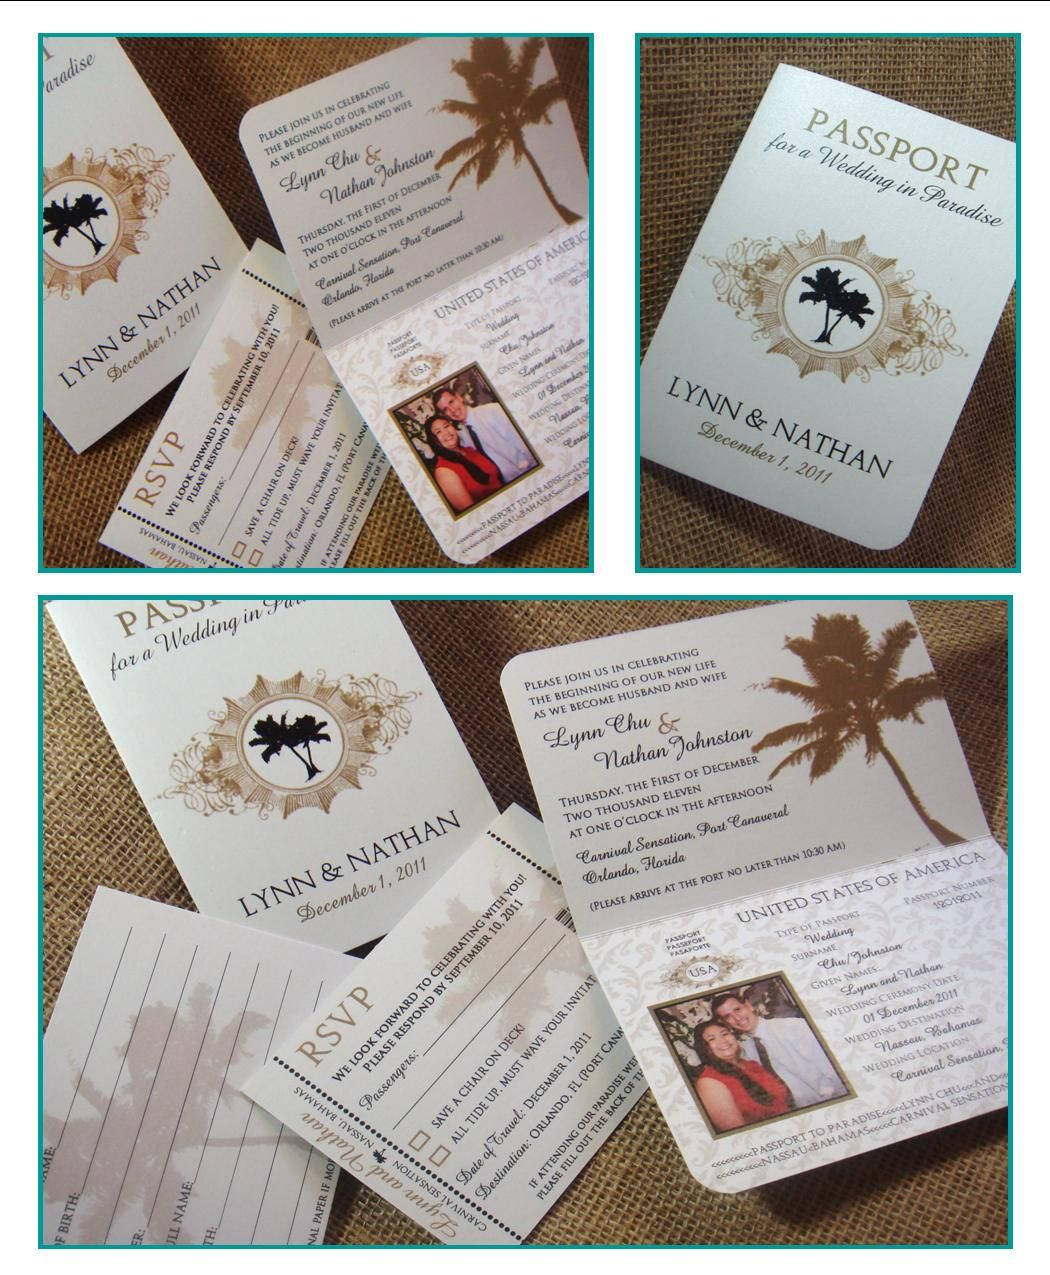 Passport Destination Wedding Invitation Boarding Pass Set Etsy Destination Wedding Invitations Boarding Pass Wedding Invitations Destination Wedding Invitations